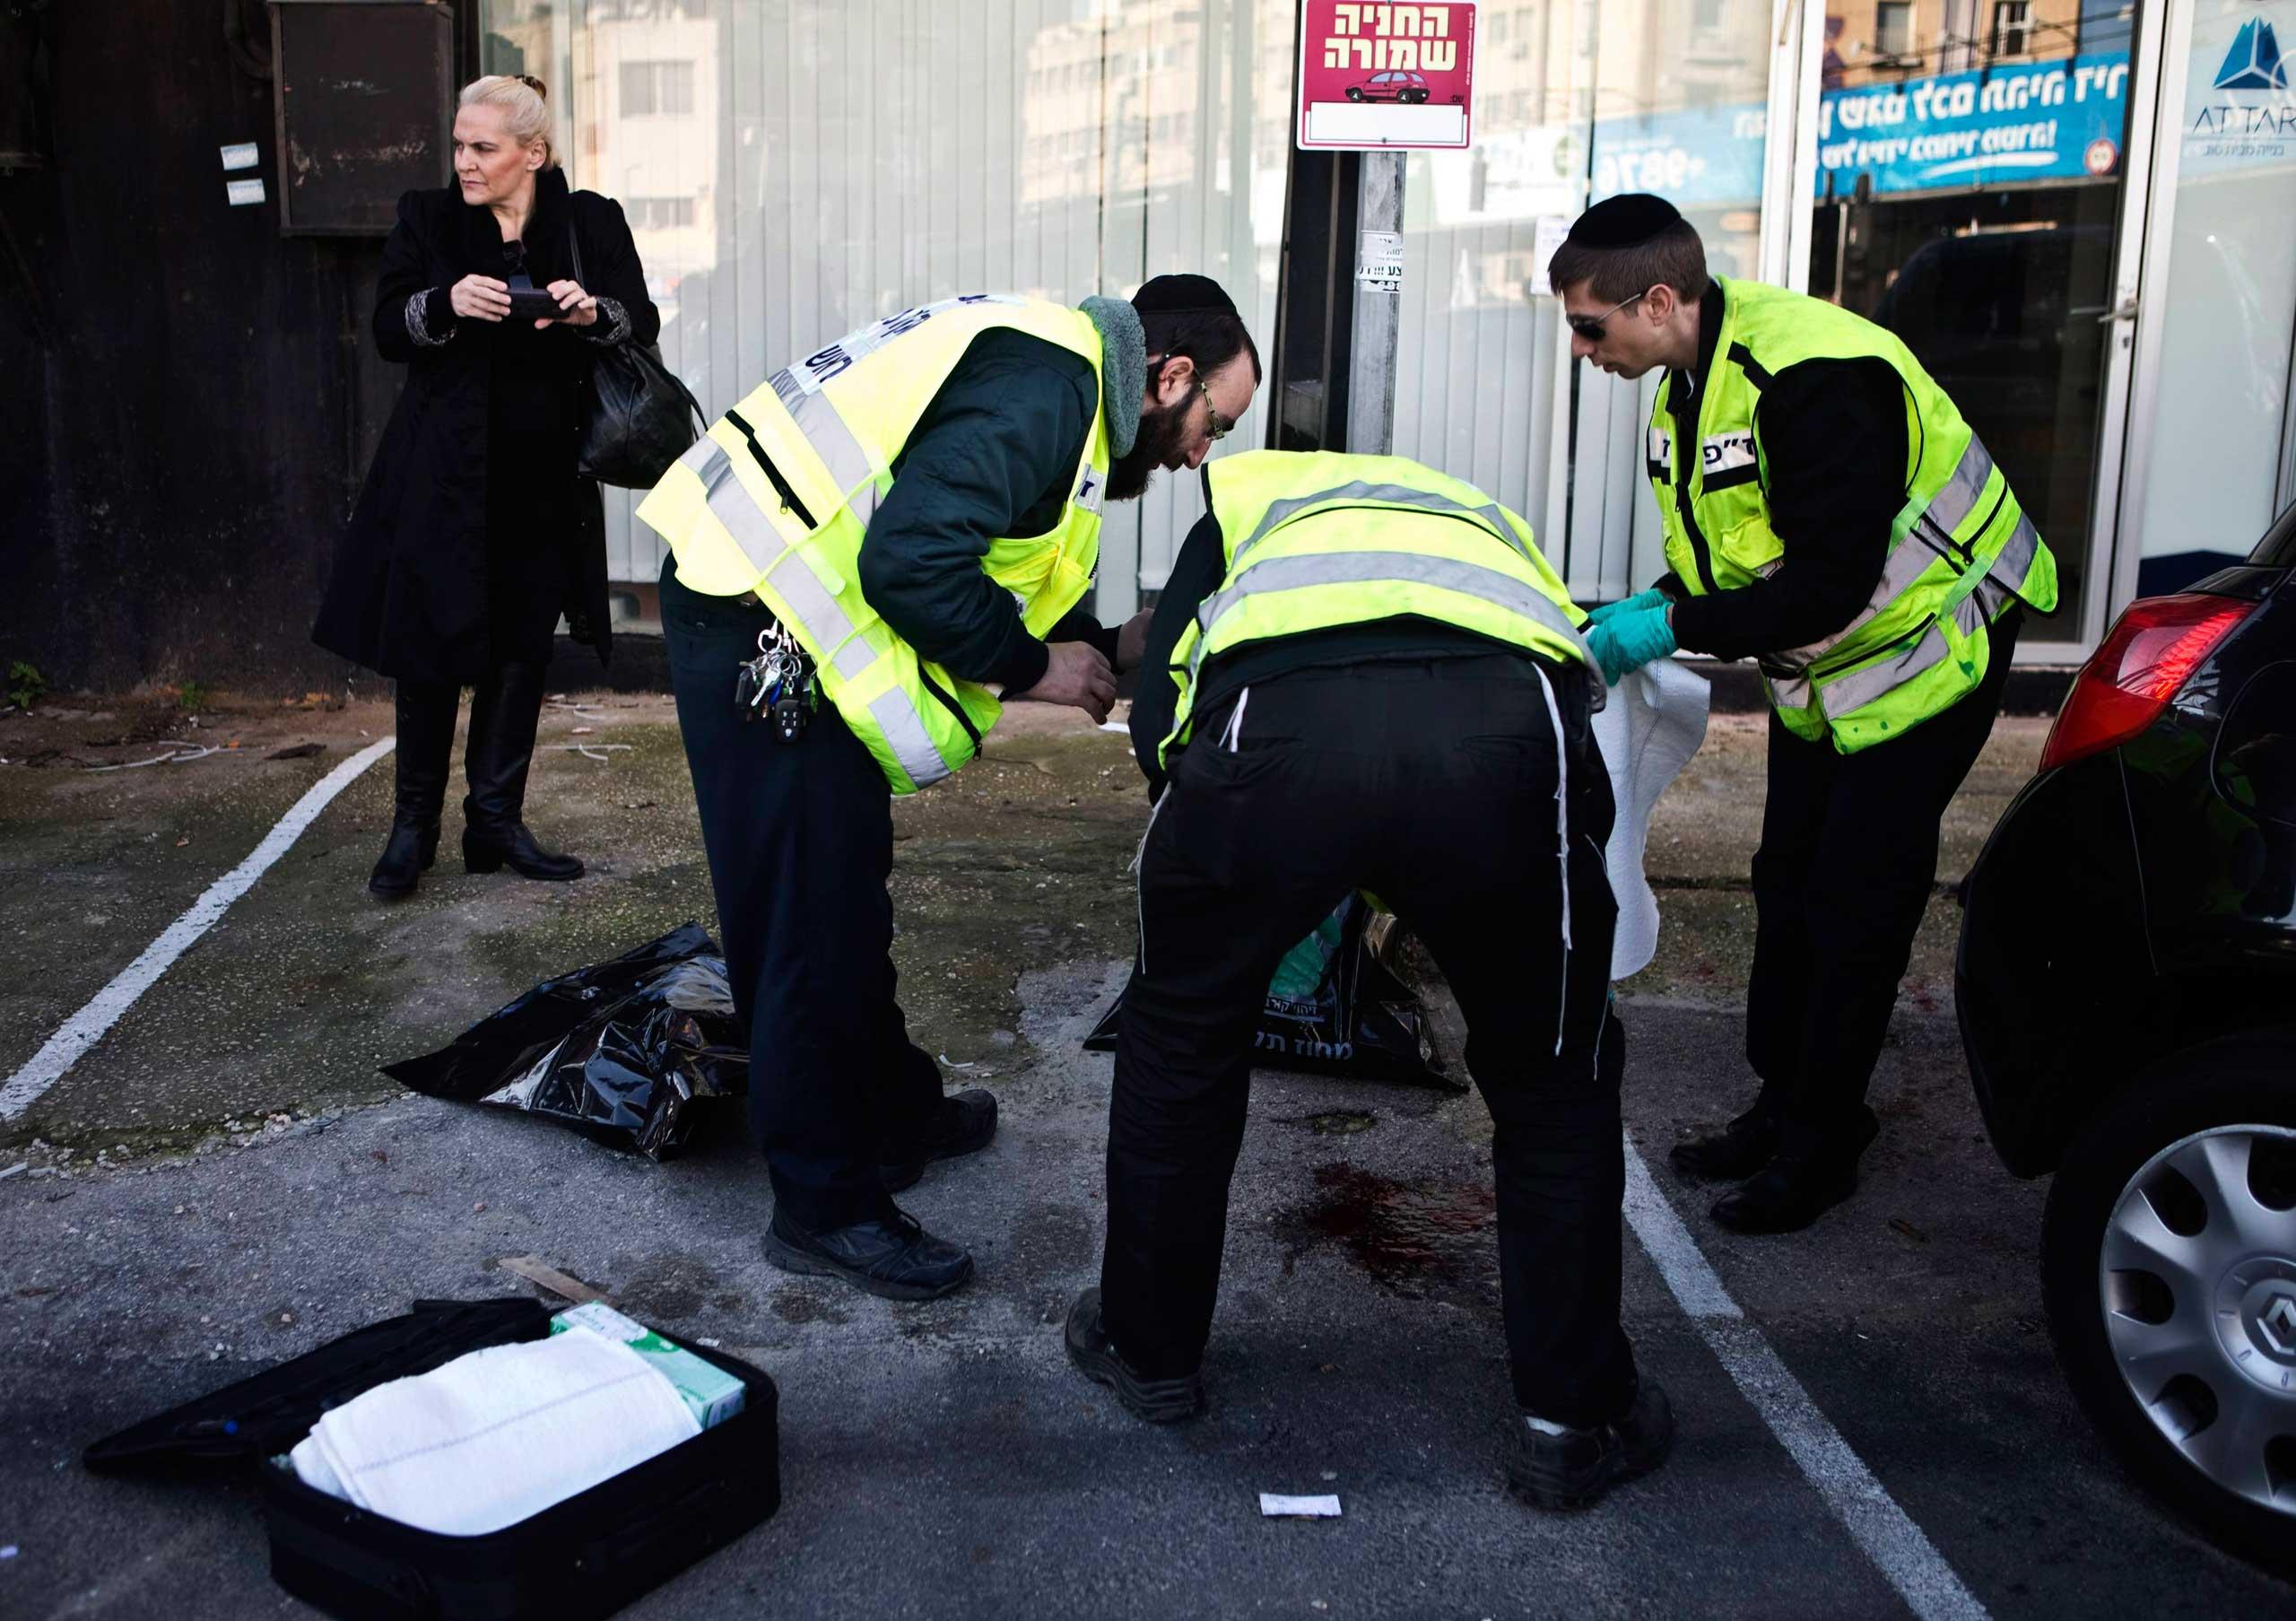 Members of the Israeli Zaka emergency response team survey the scene of a stabbing attack in Tel Aviv, Jan. 21, 2015.